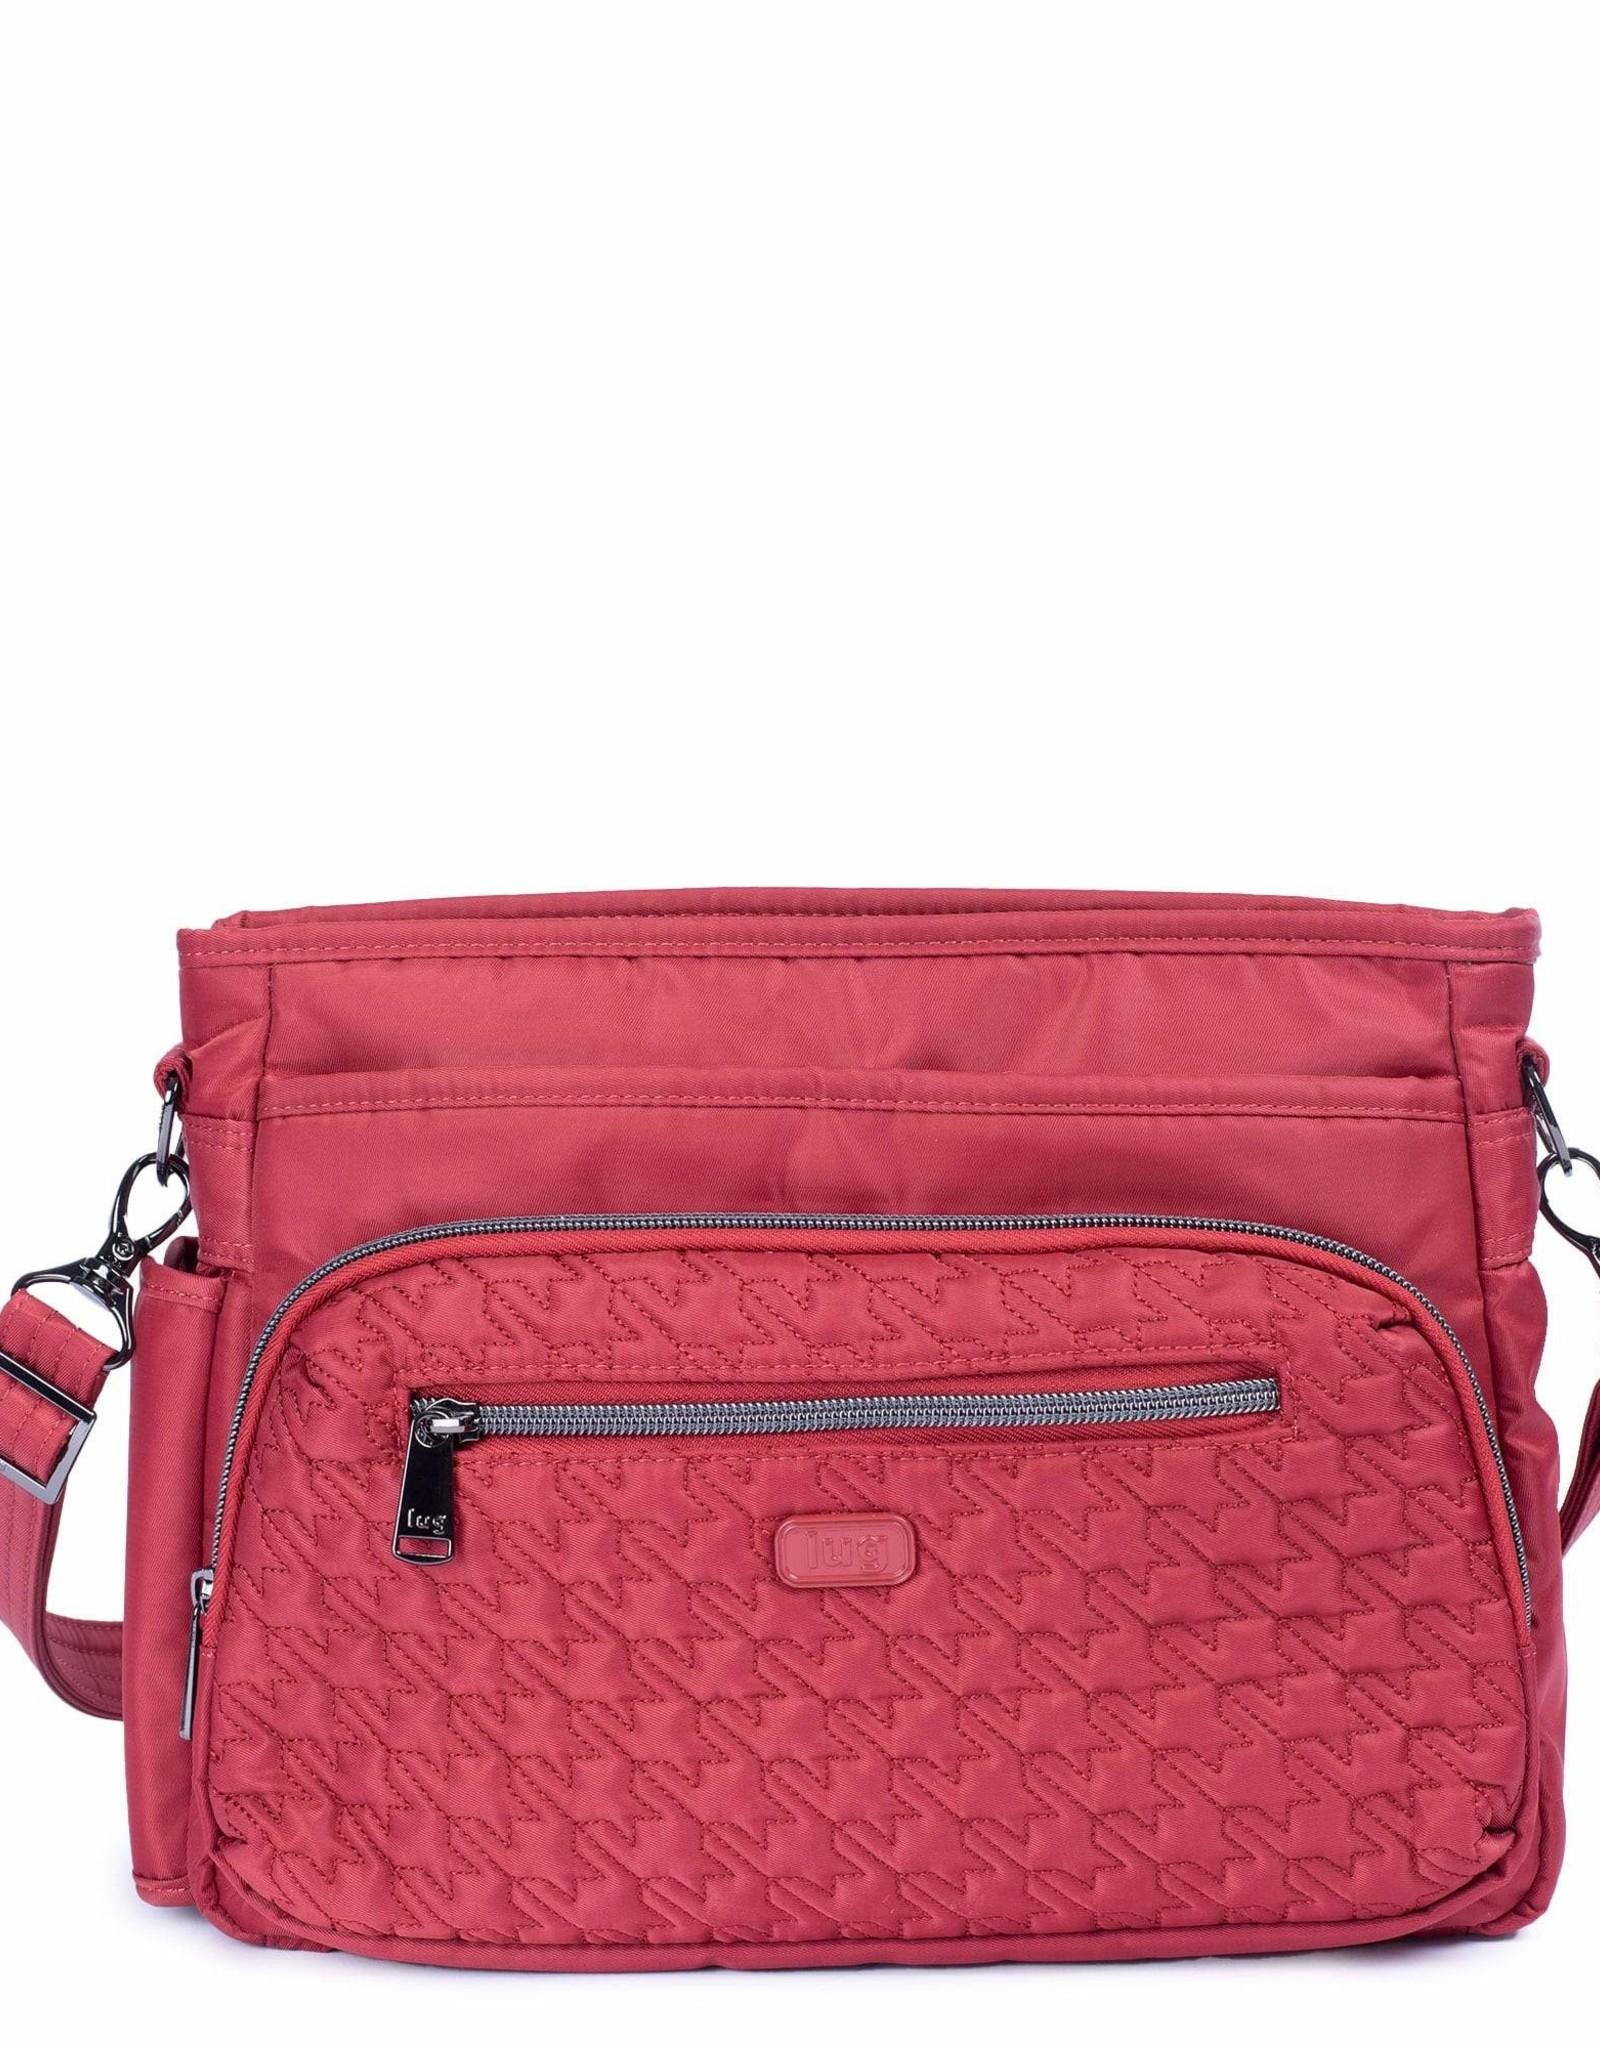 Lug Shimmy SE Cross Body Bag